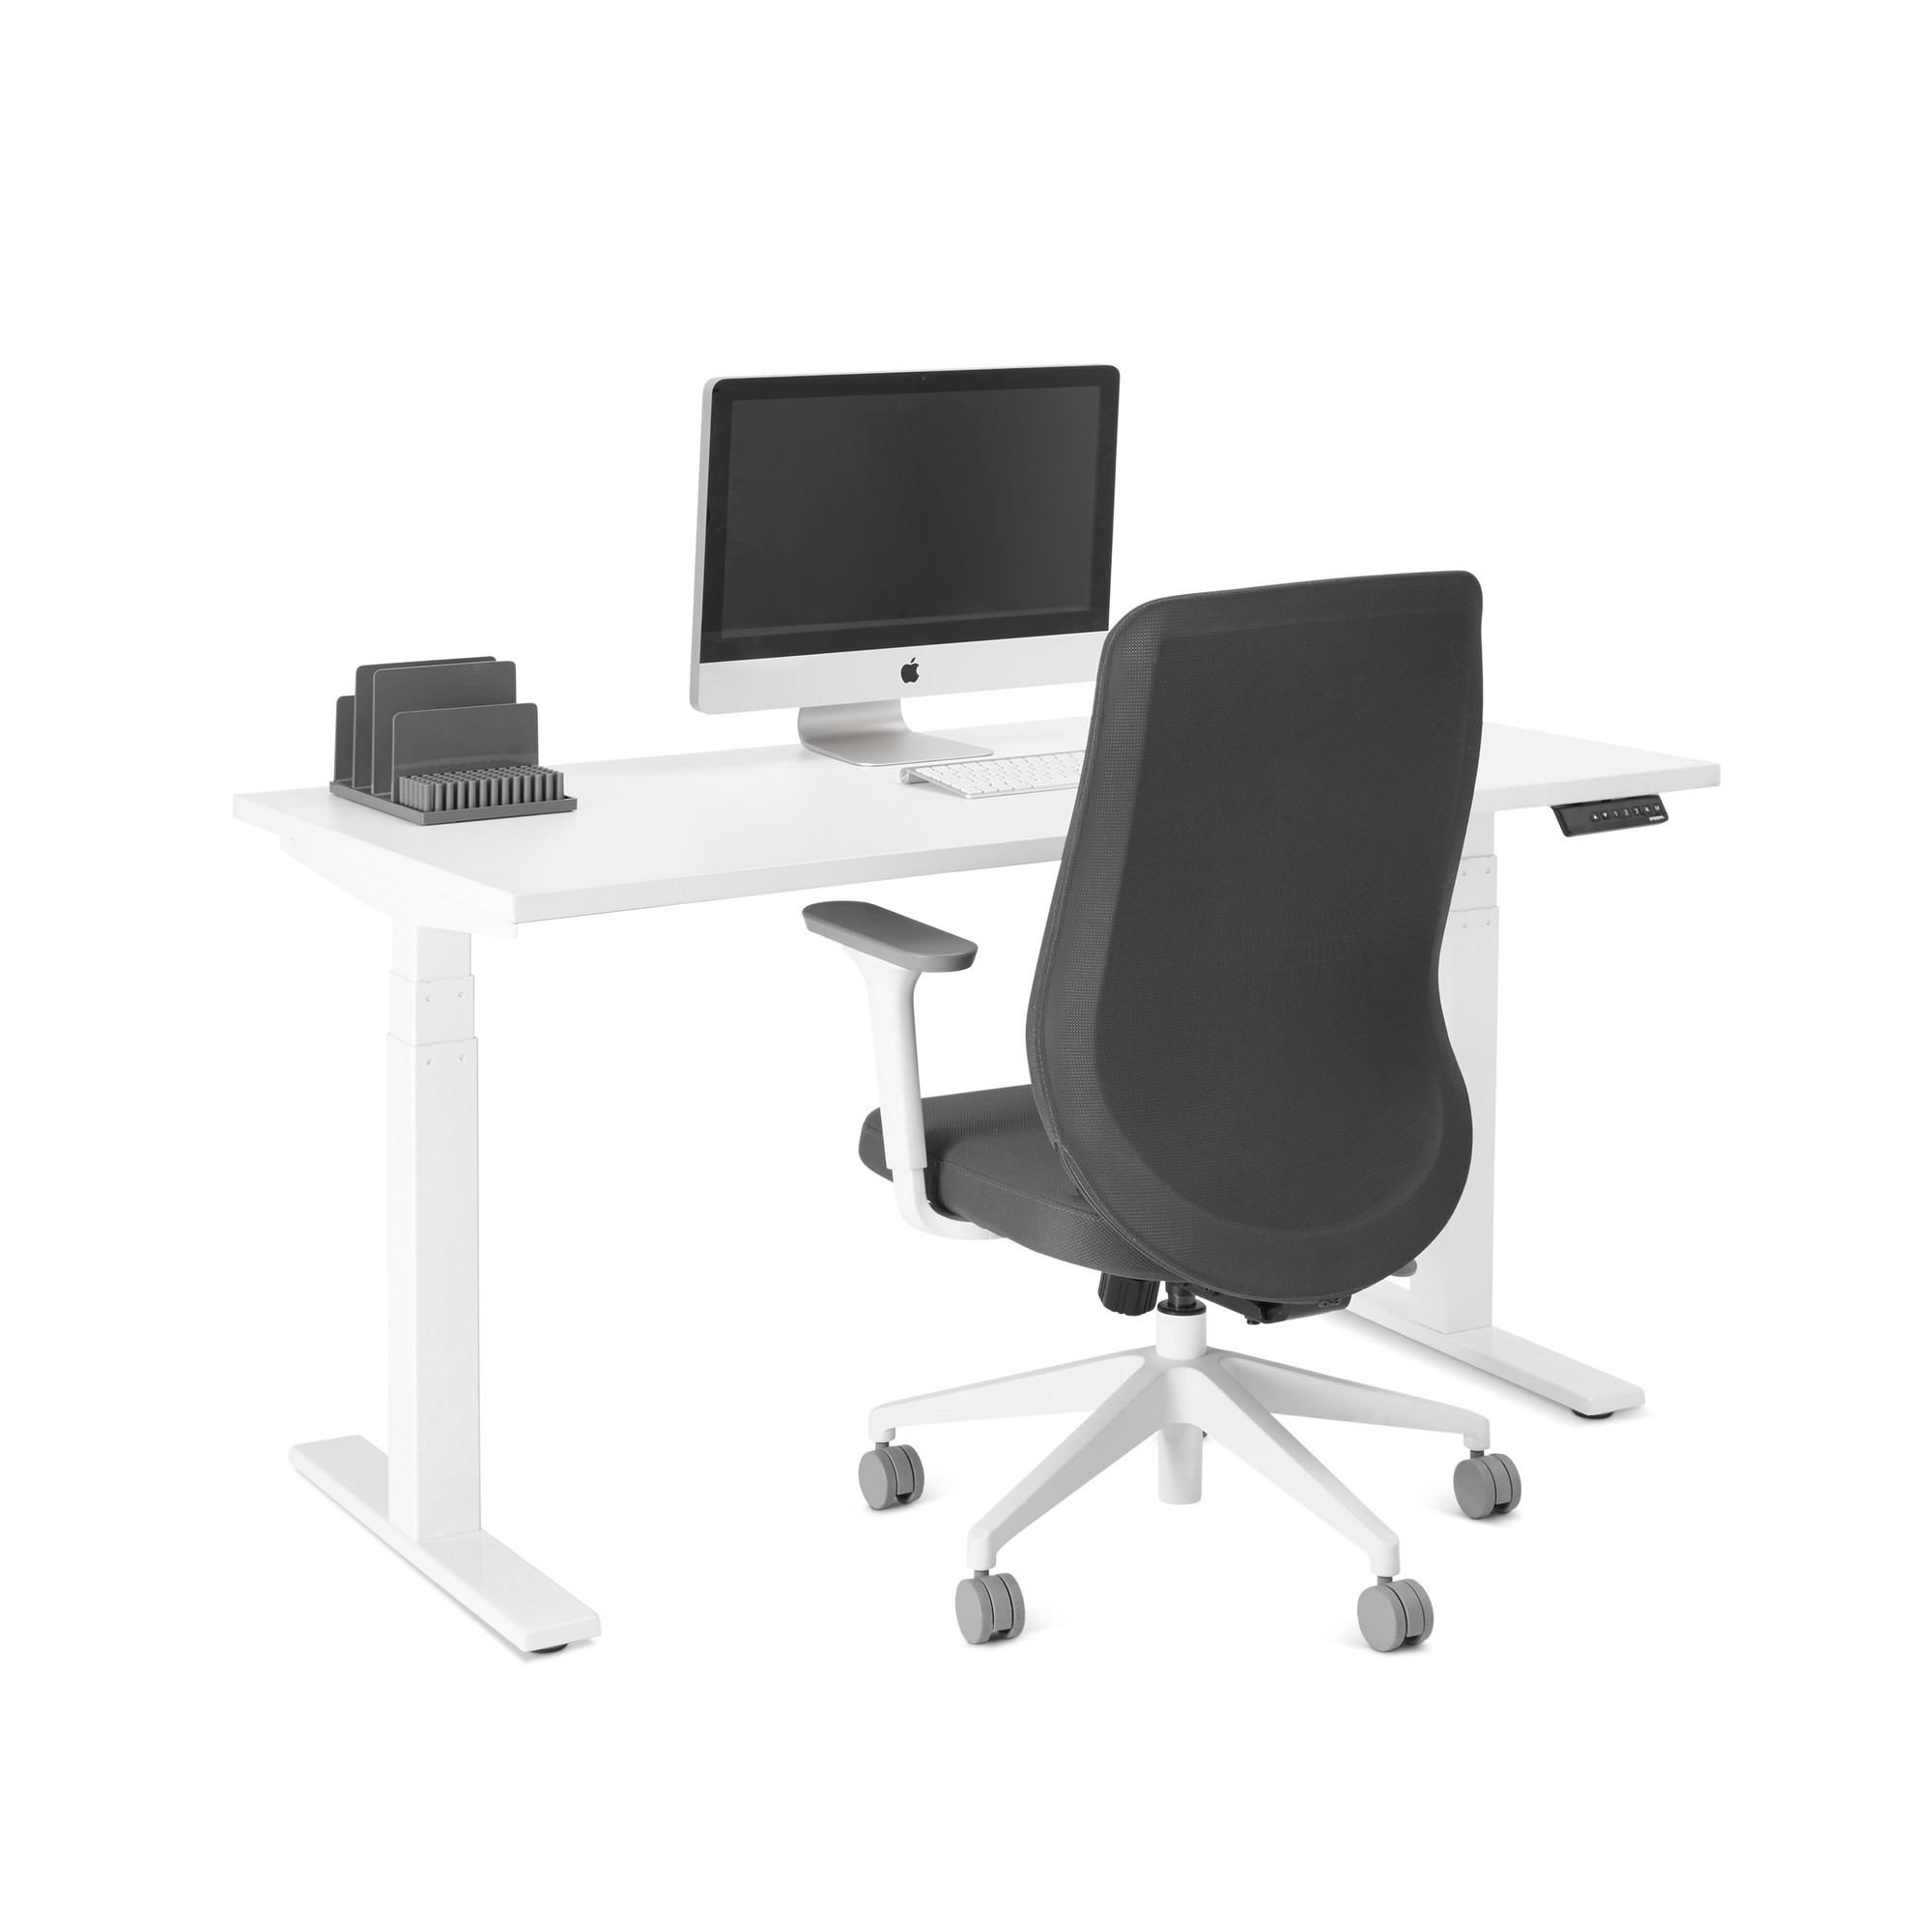 loft single desk white 57 white legswhitehi - Adjustable Height Computer Desk